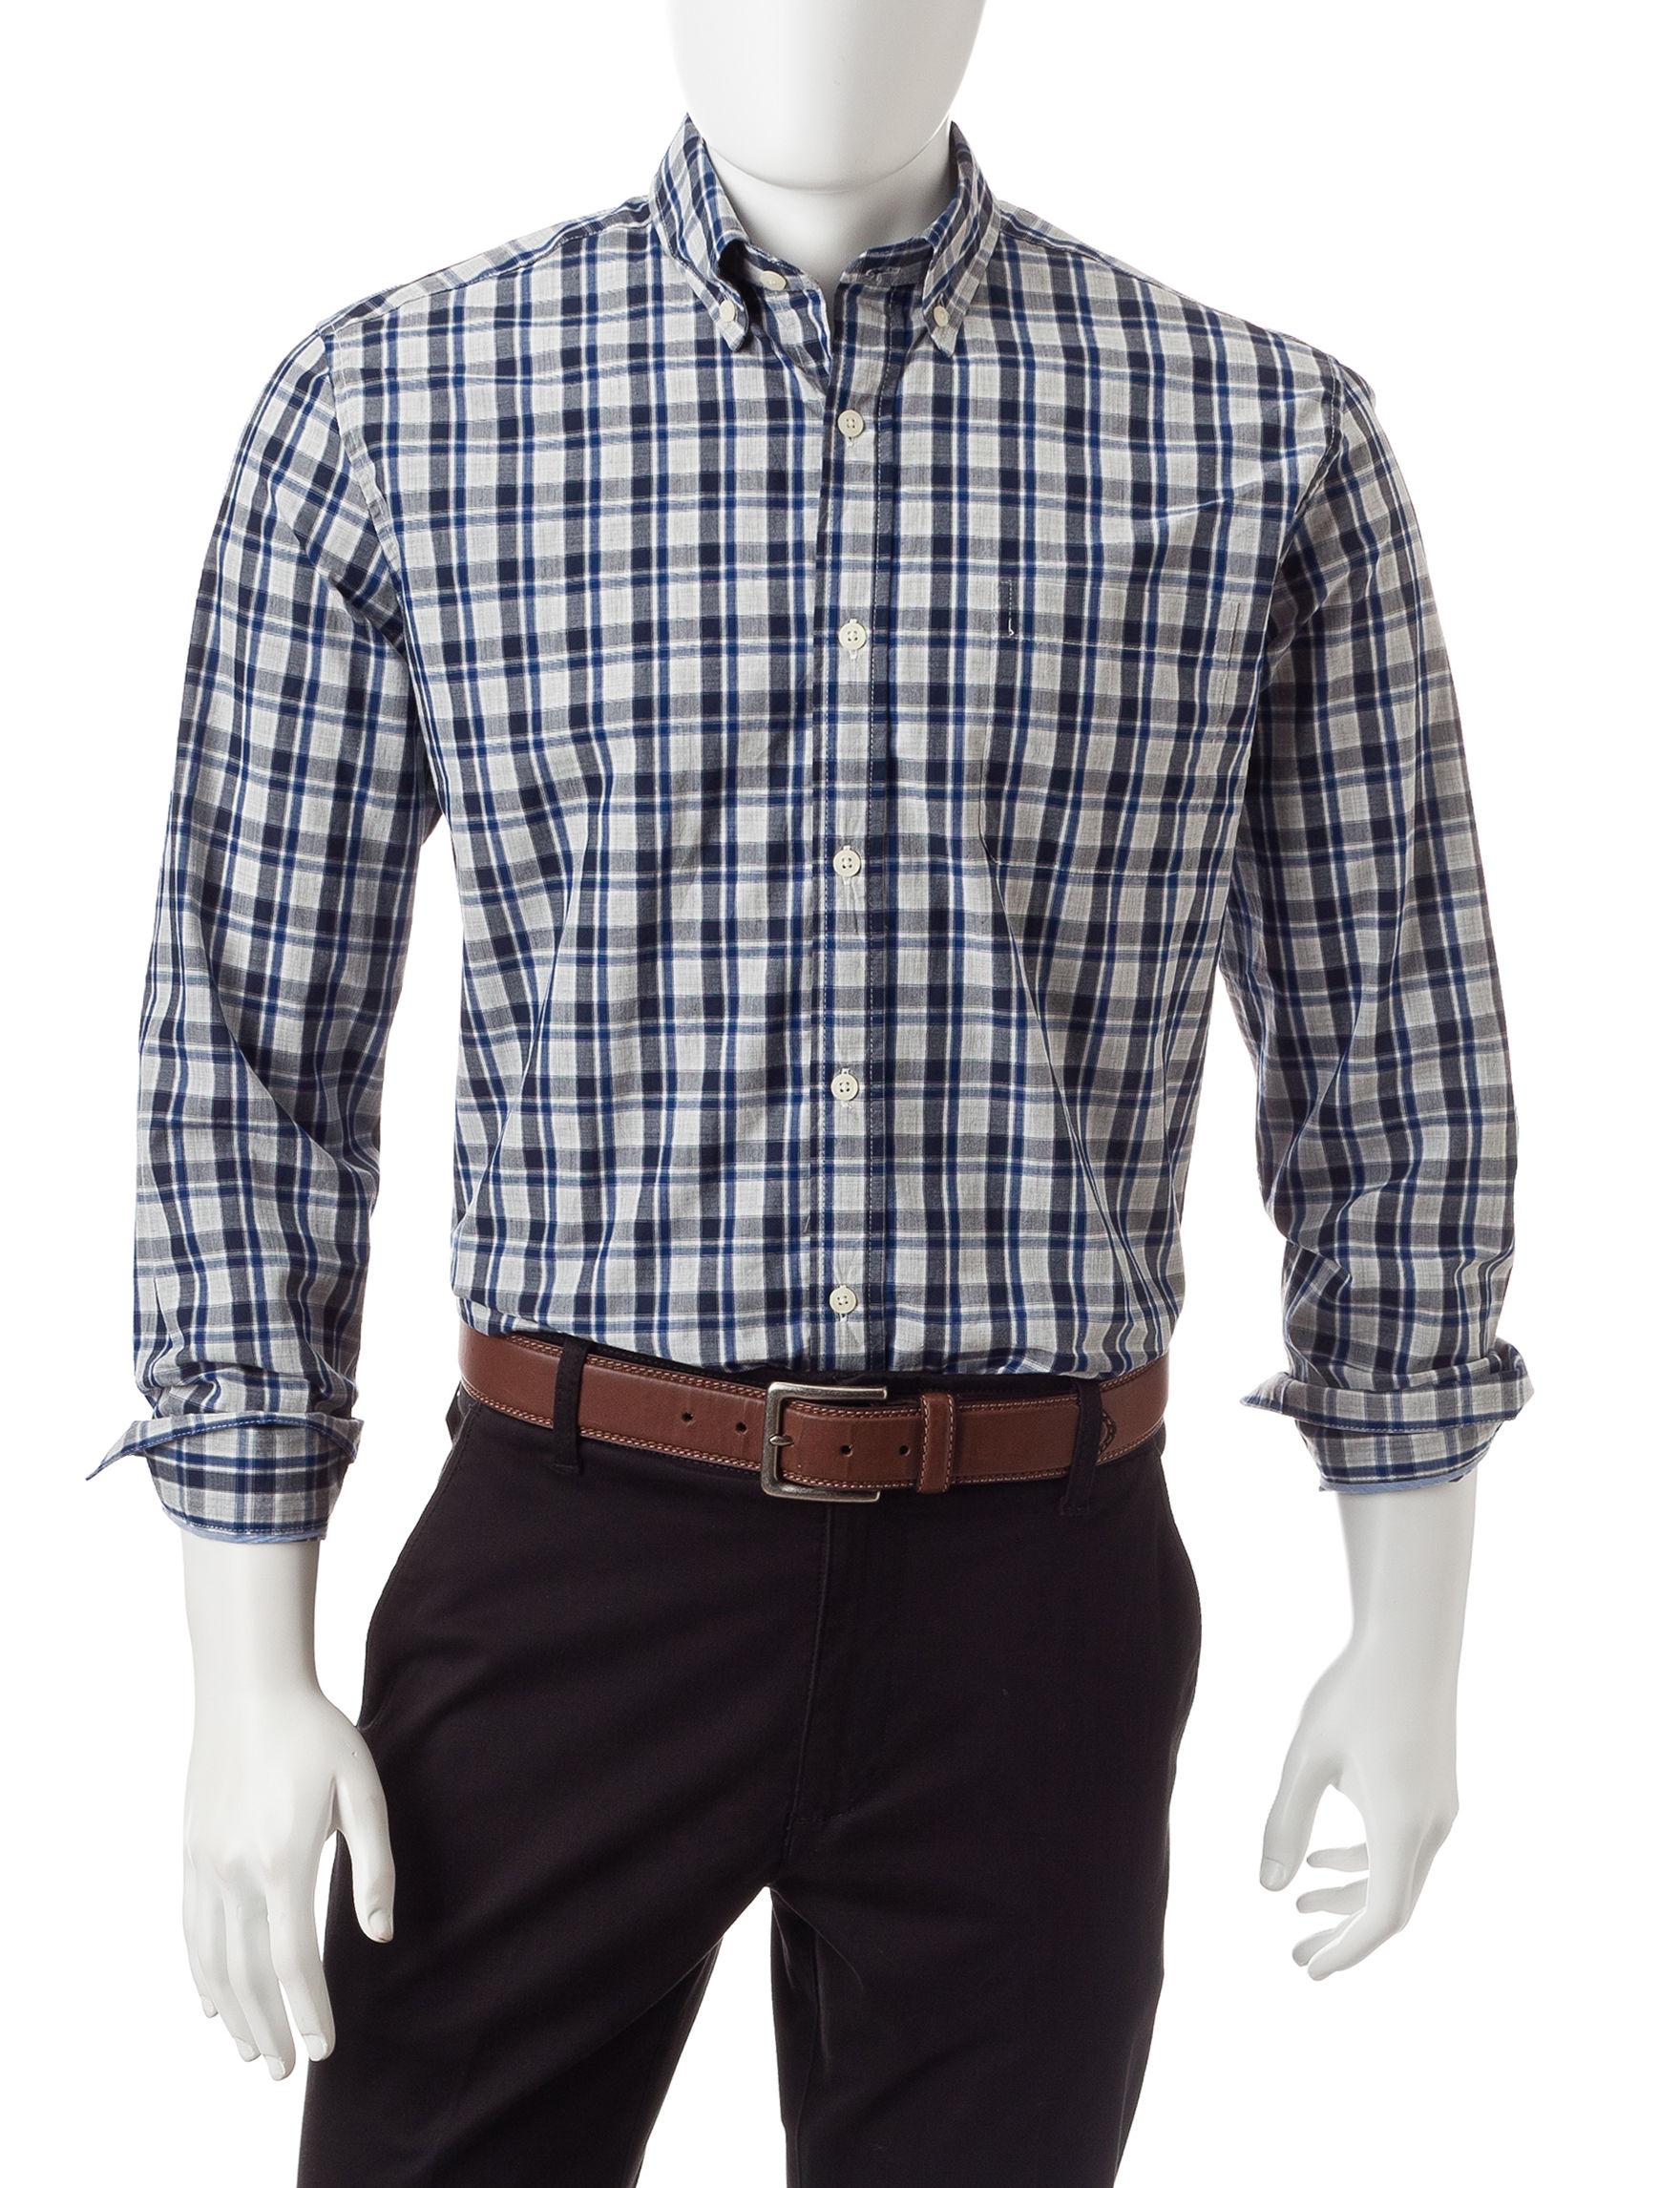 U.S. Polo Assn. Blue / Grey Casual Button Down Shirts